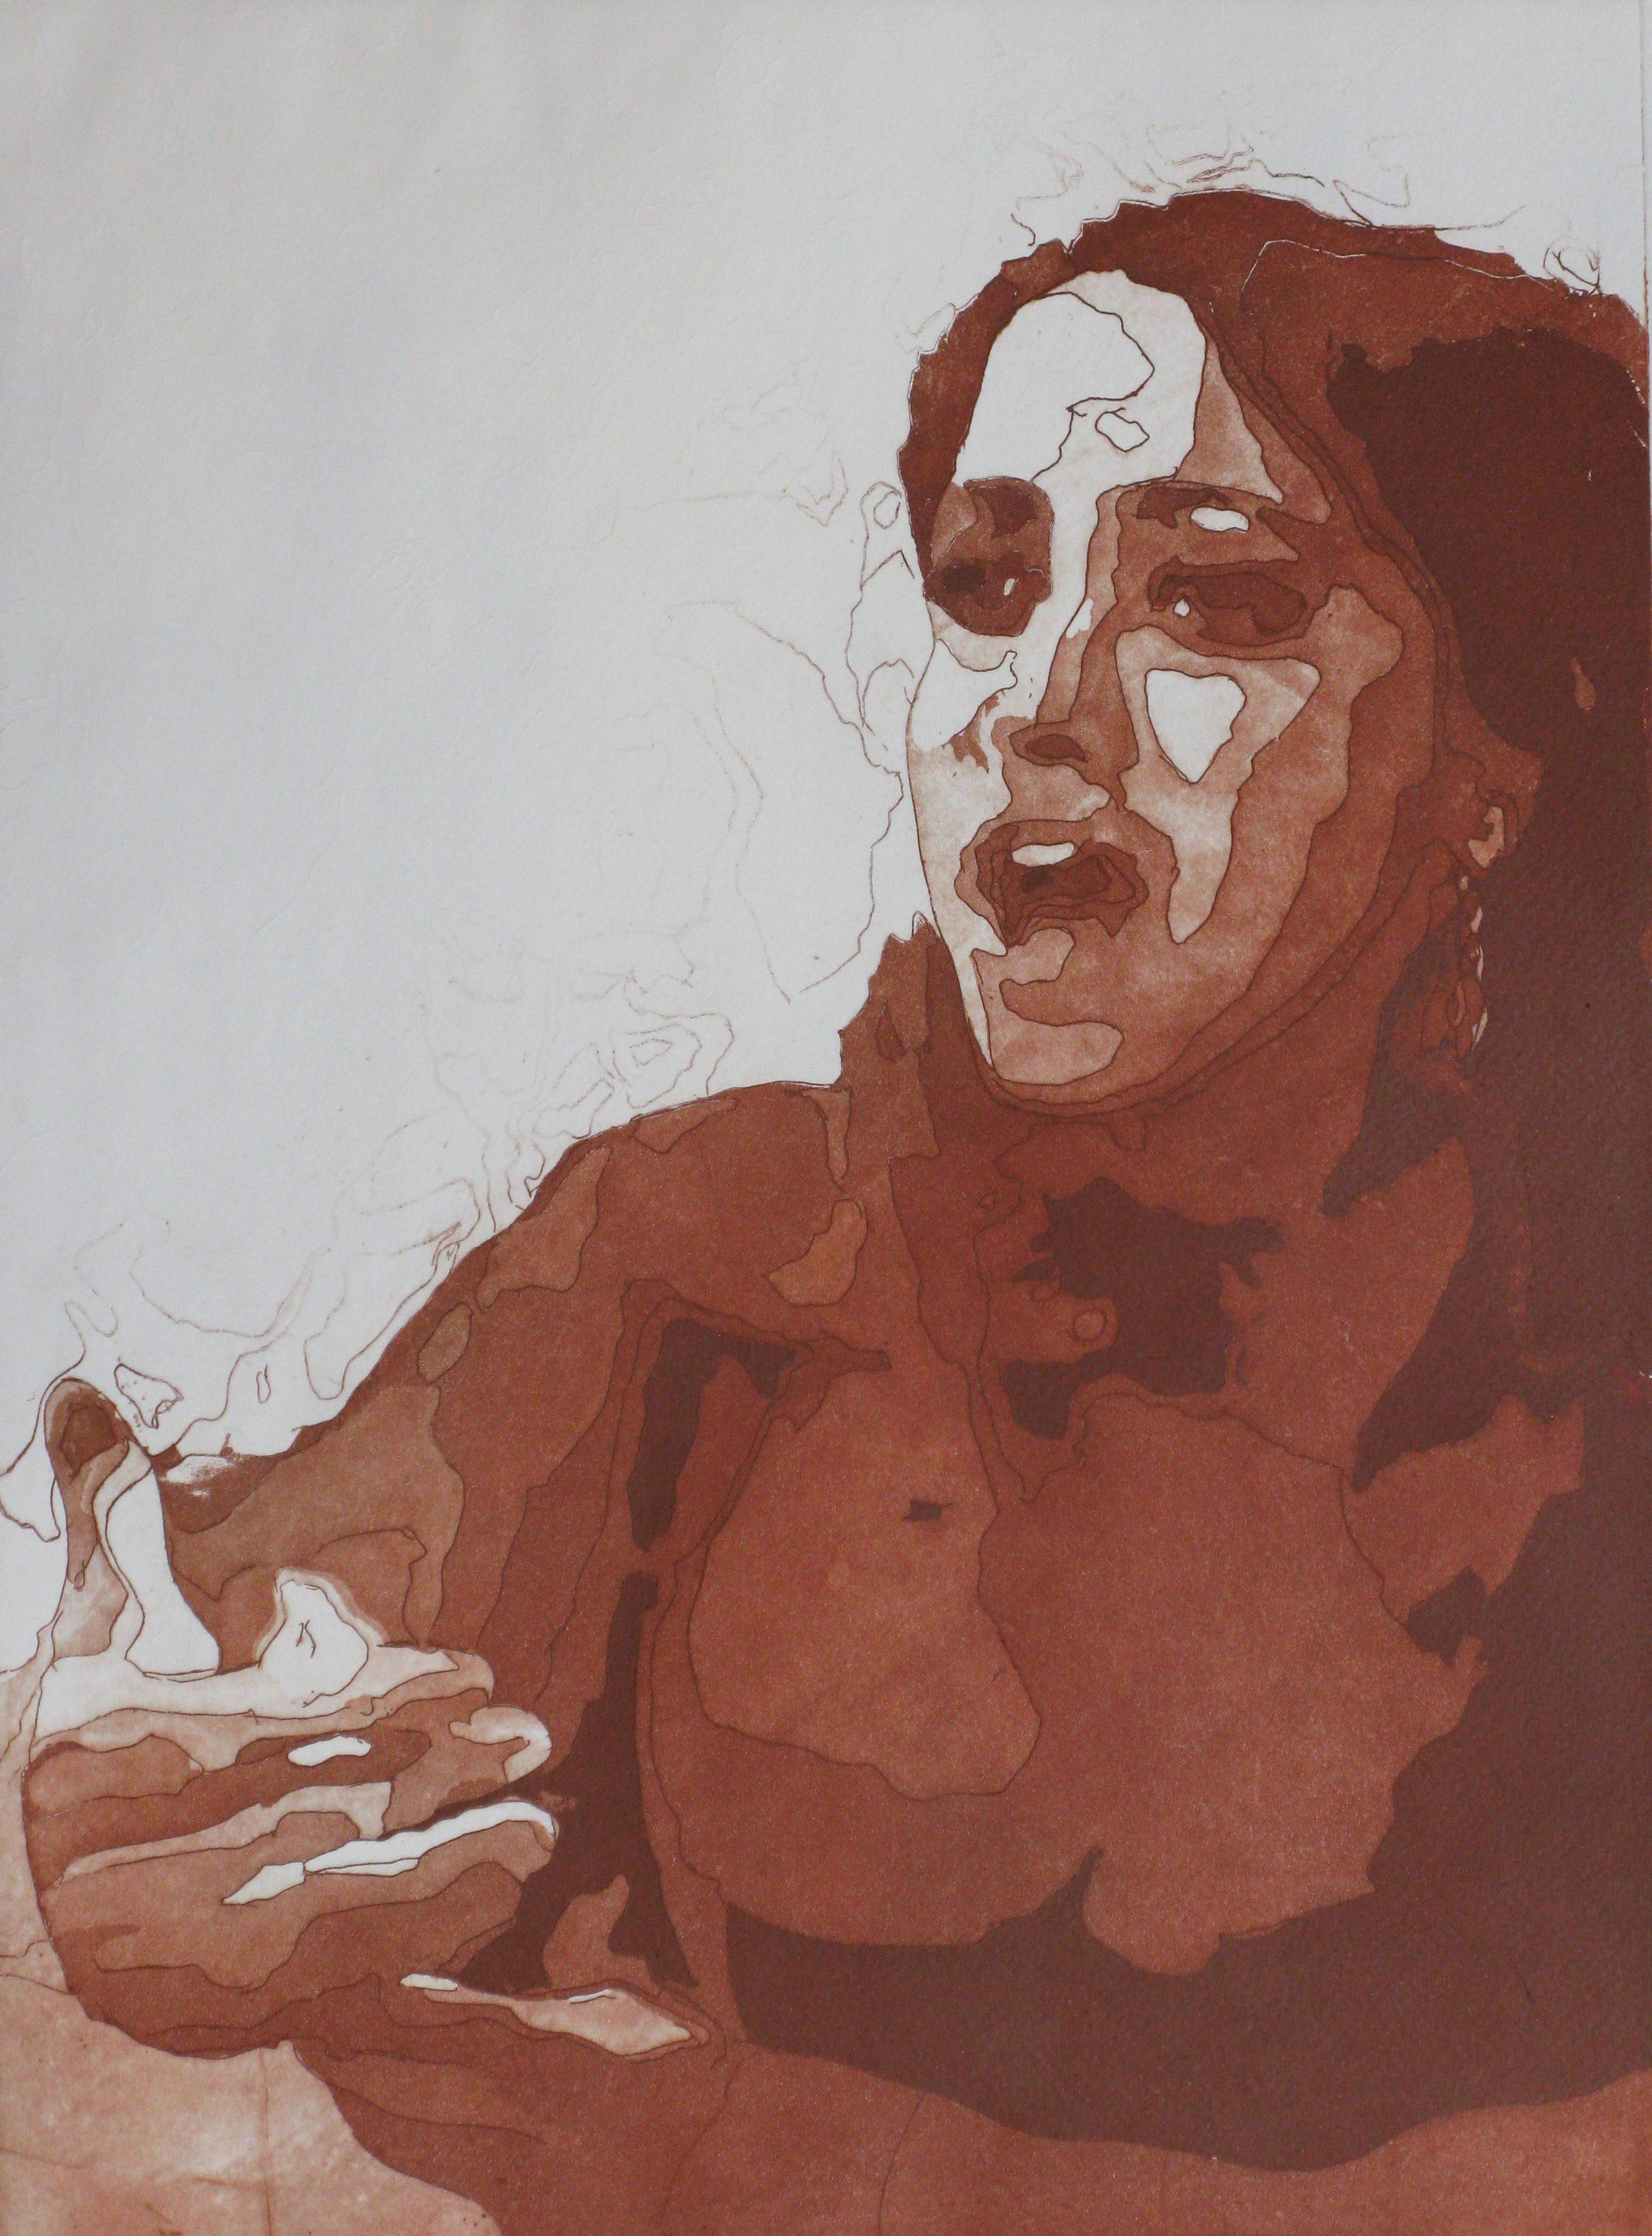 Le Printemps arabe (2) Chanteuse Tunisienne Emel Mathlouthi